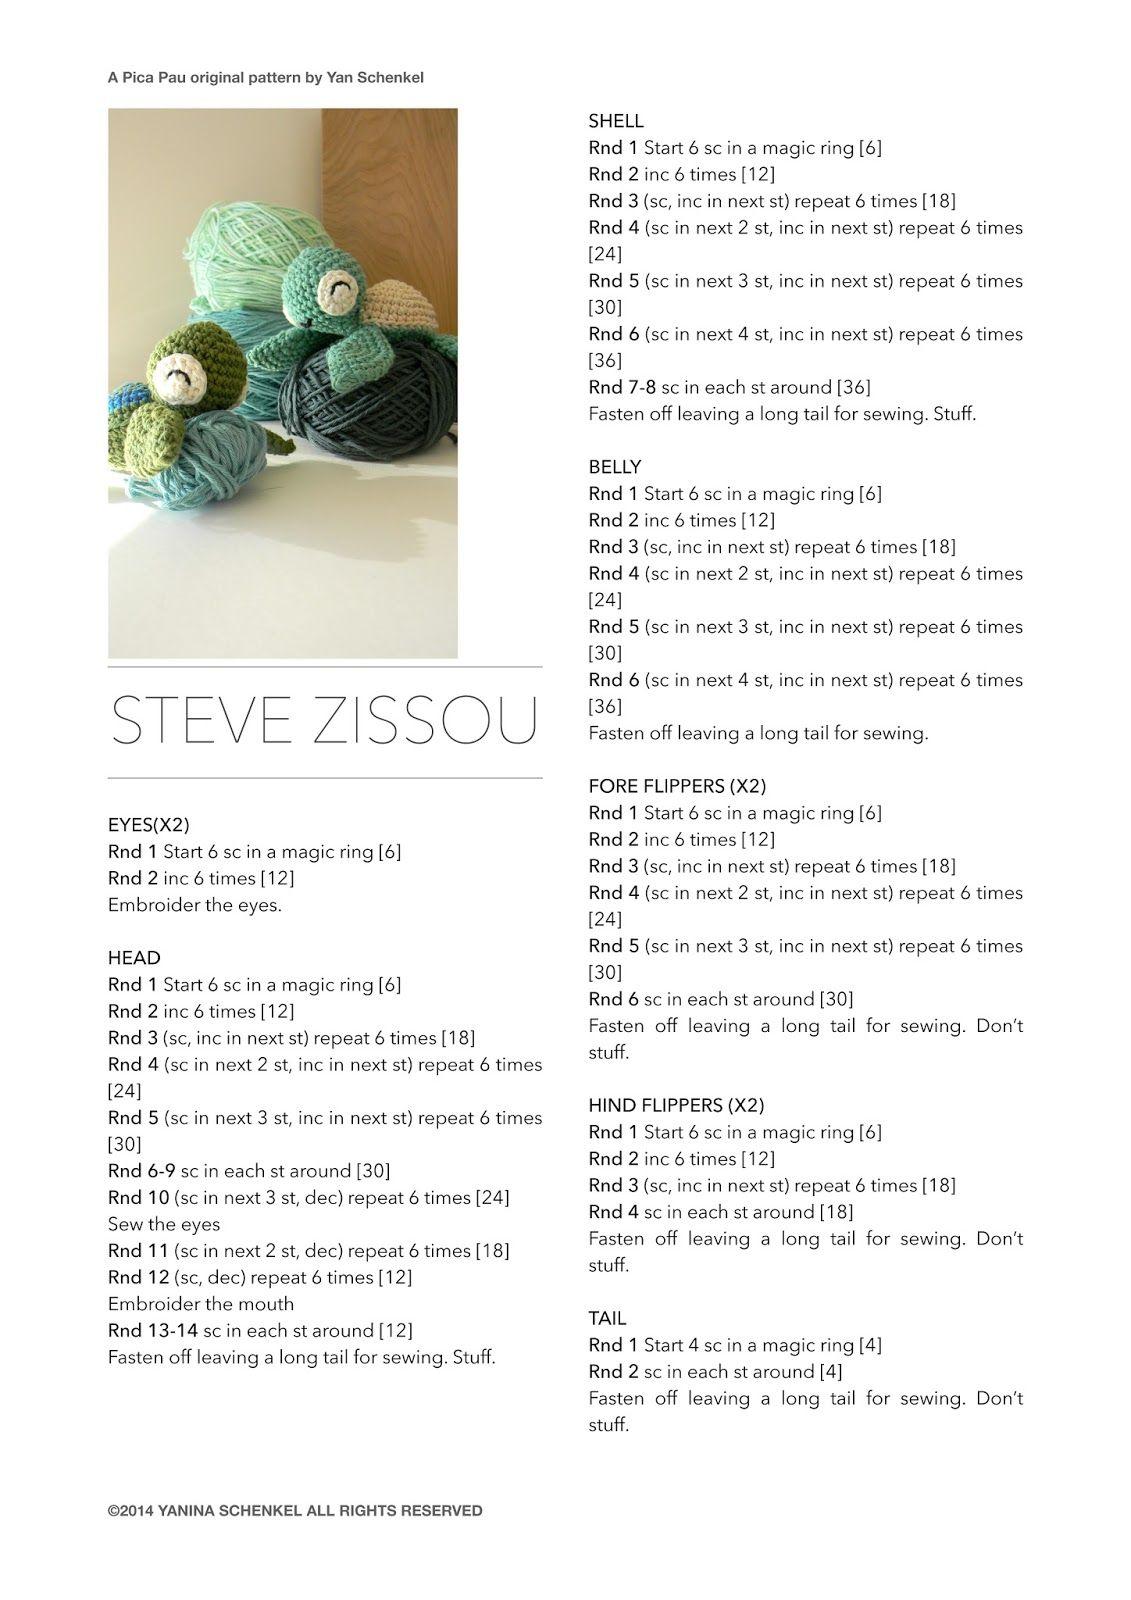 pica-pau: Steve (Zissou)   Crochet!   Pinterest   Patrones amigurumi ...